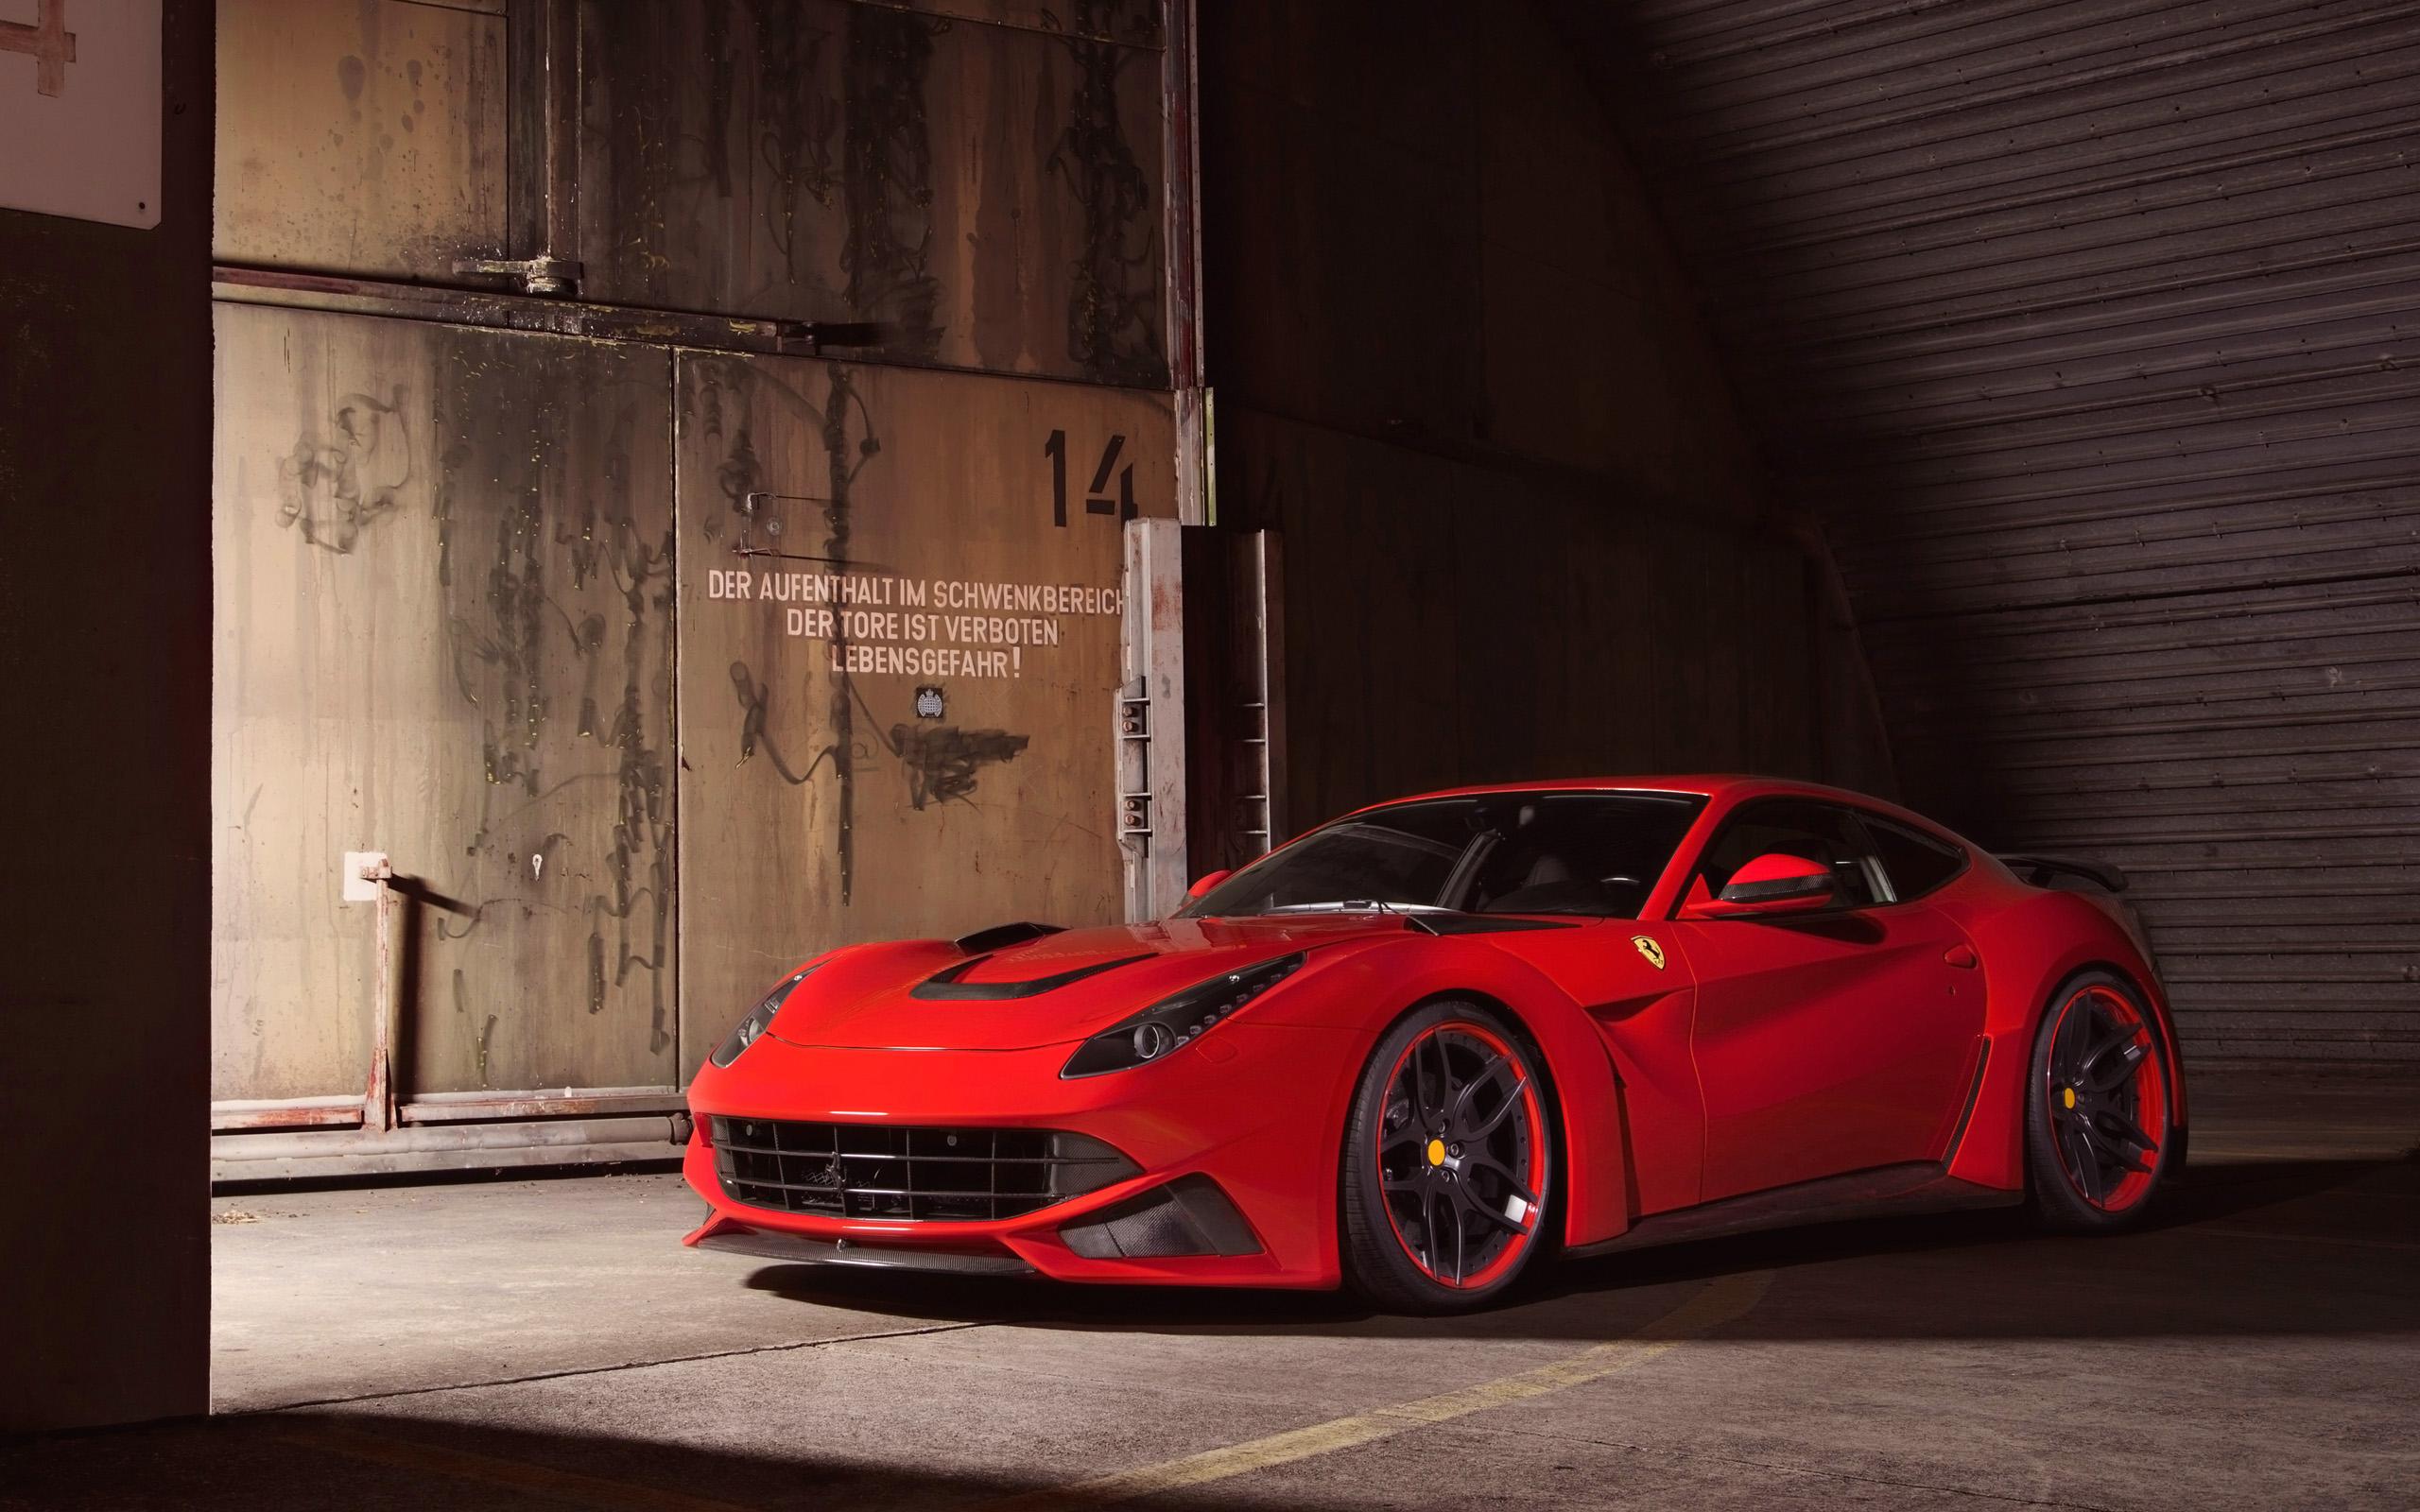 2014 Ferrari F12 berlinetta N LARGO By Novitec Rosso 4146607 2560x1600